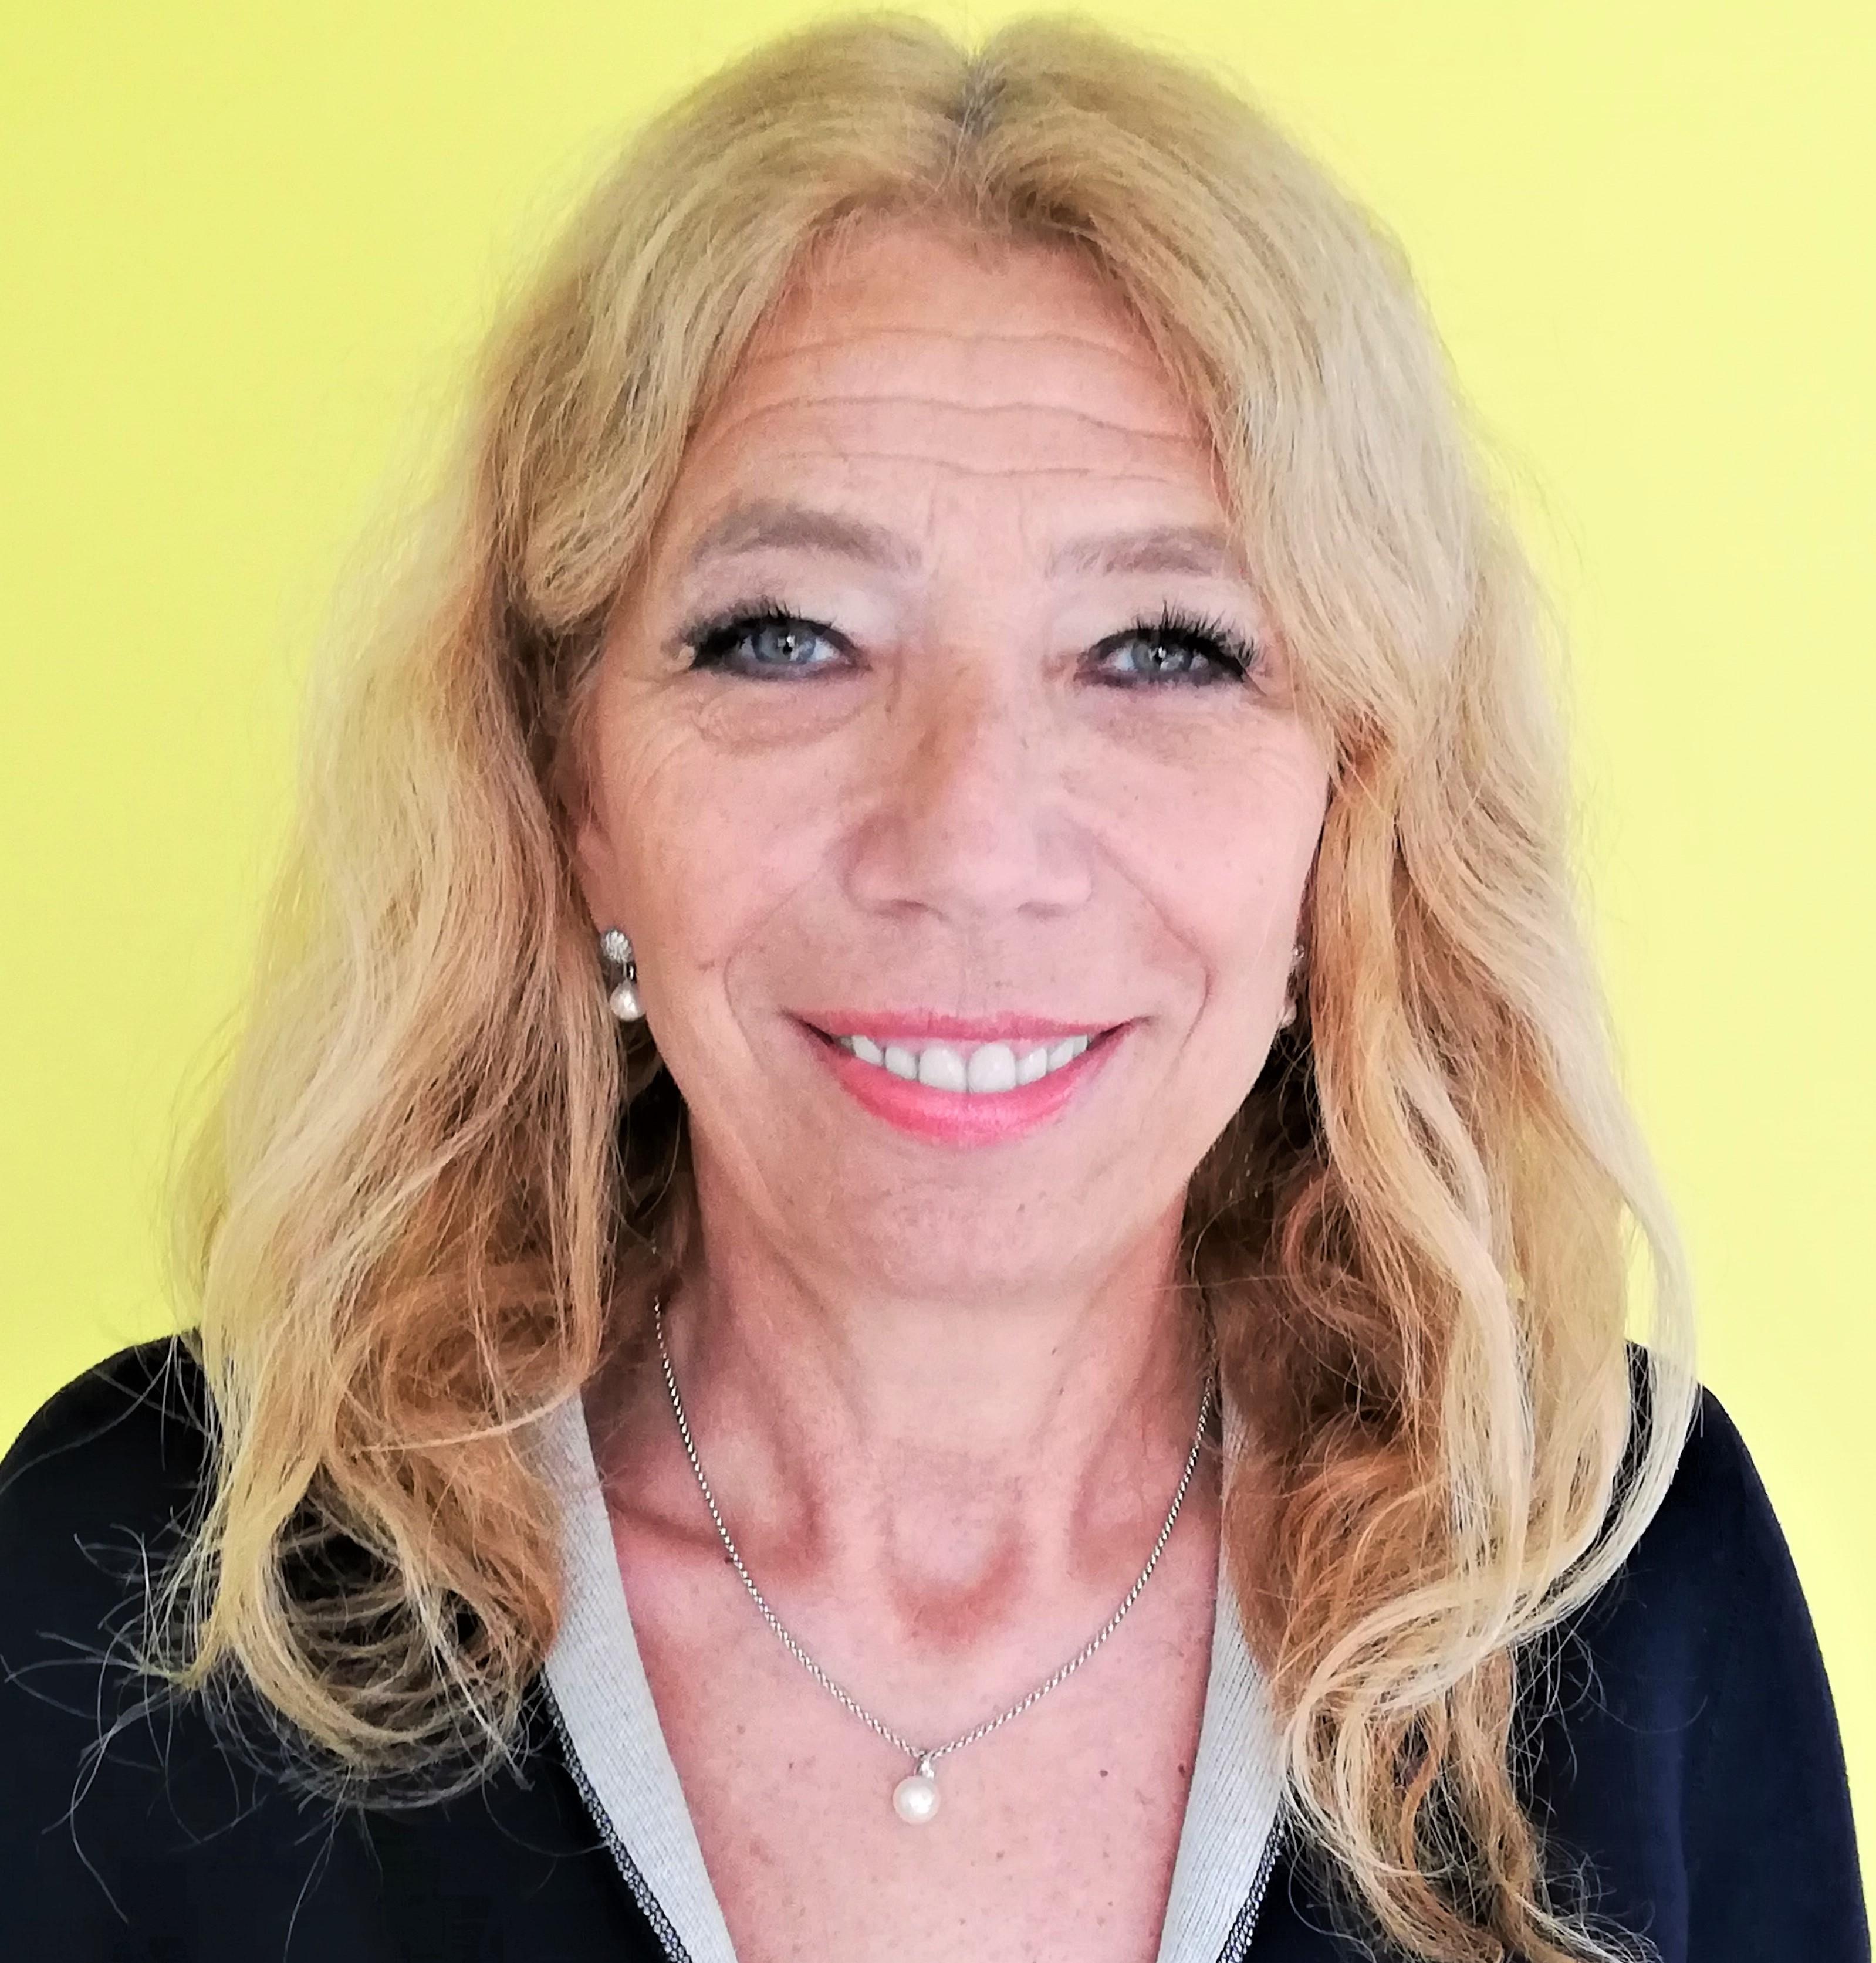 Dr. Lisa Federle